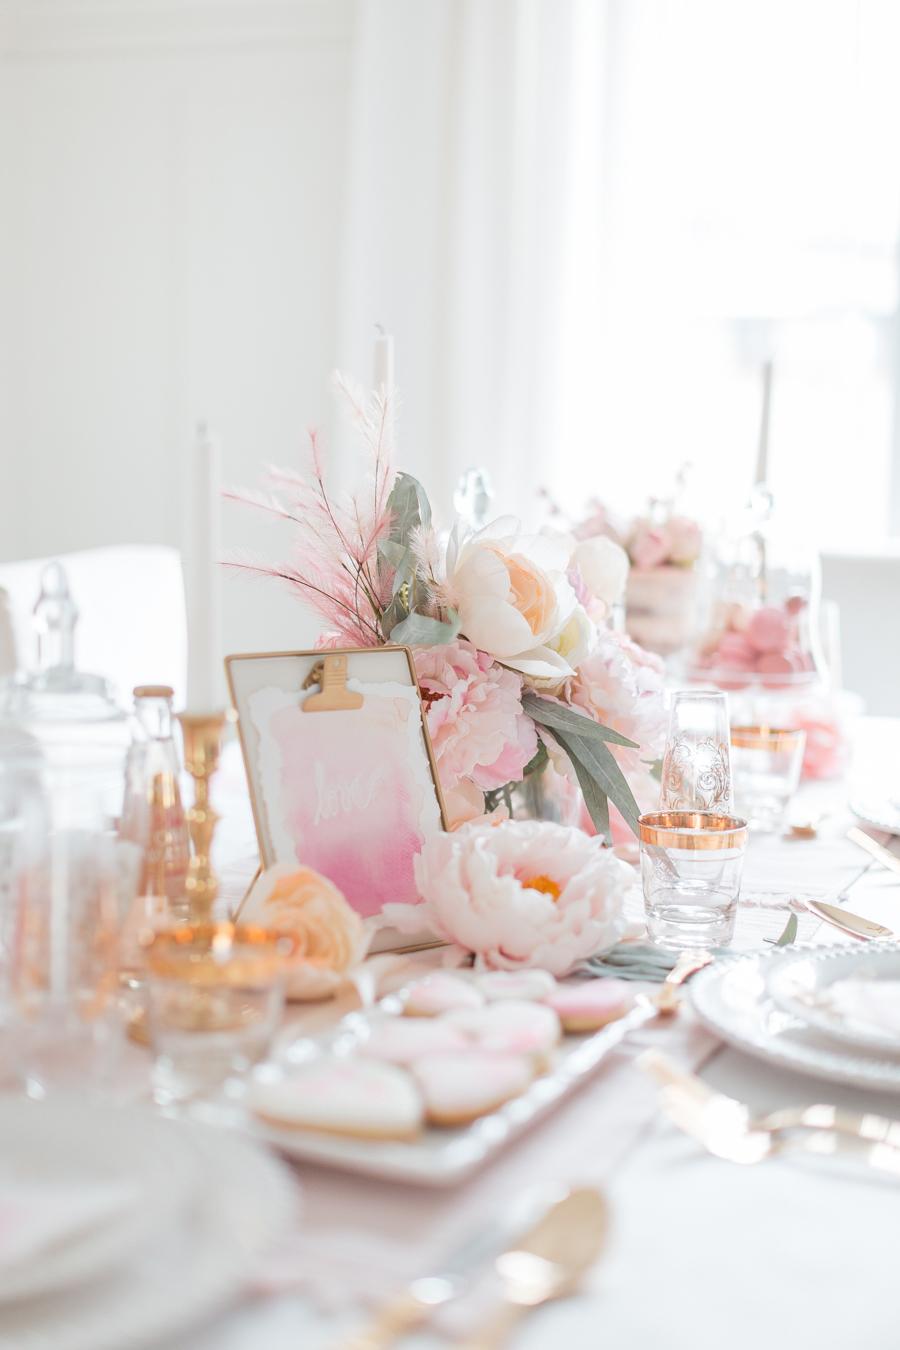 Elegant Valentine's Day Tablescape Ideas   Randi Garrett Designs